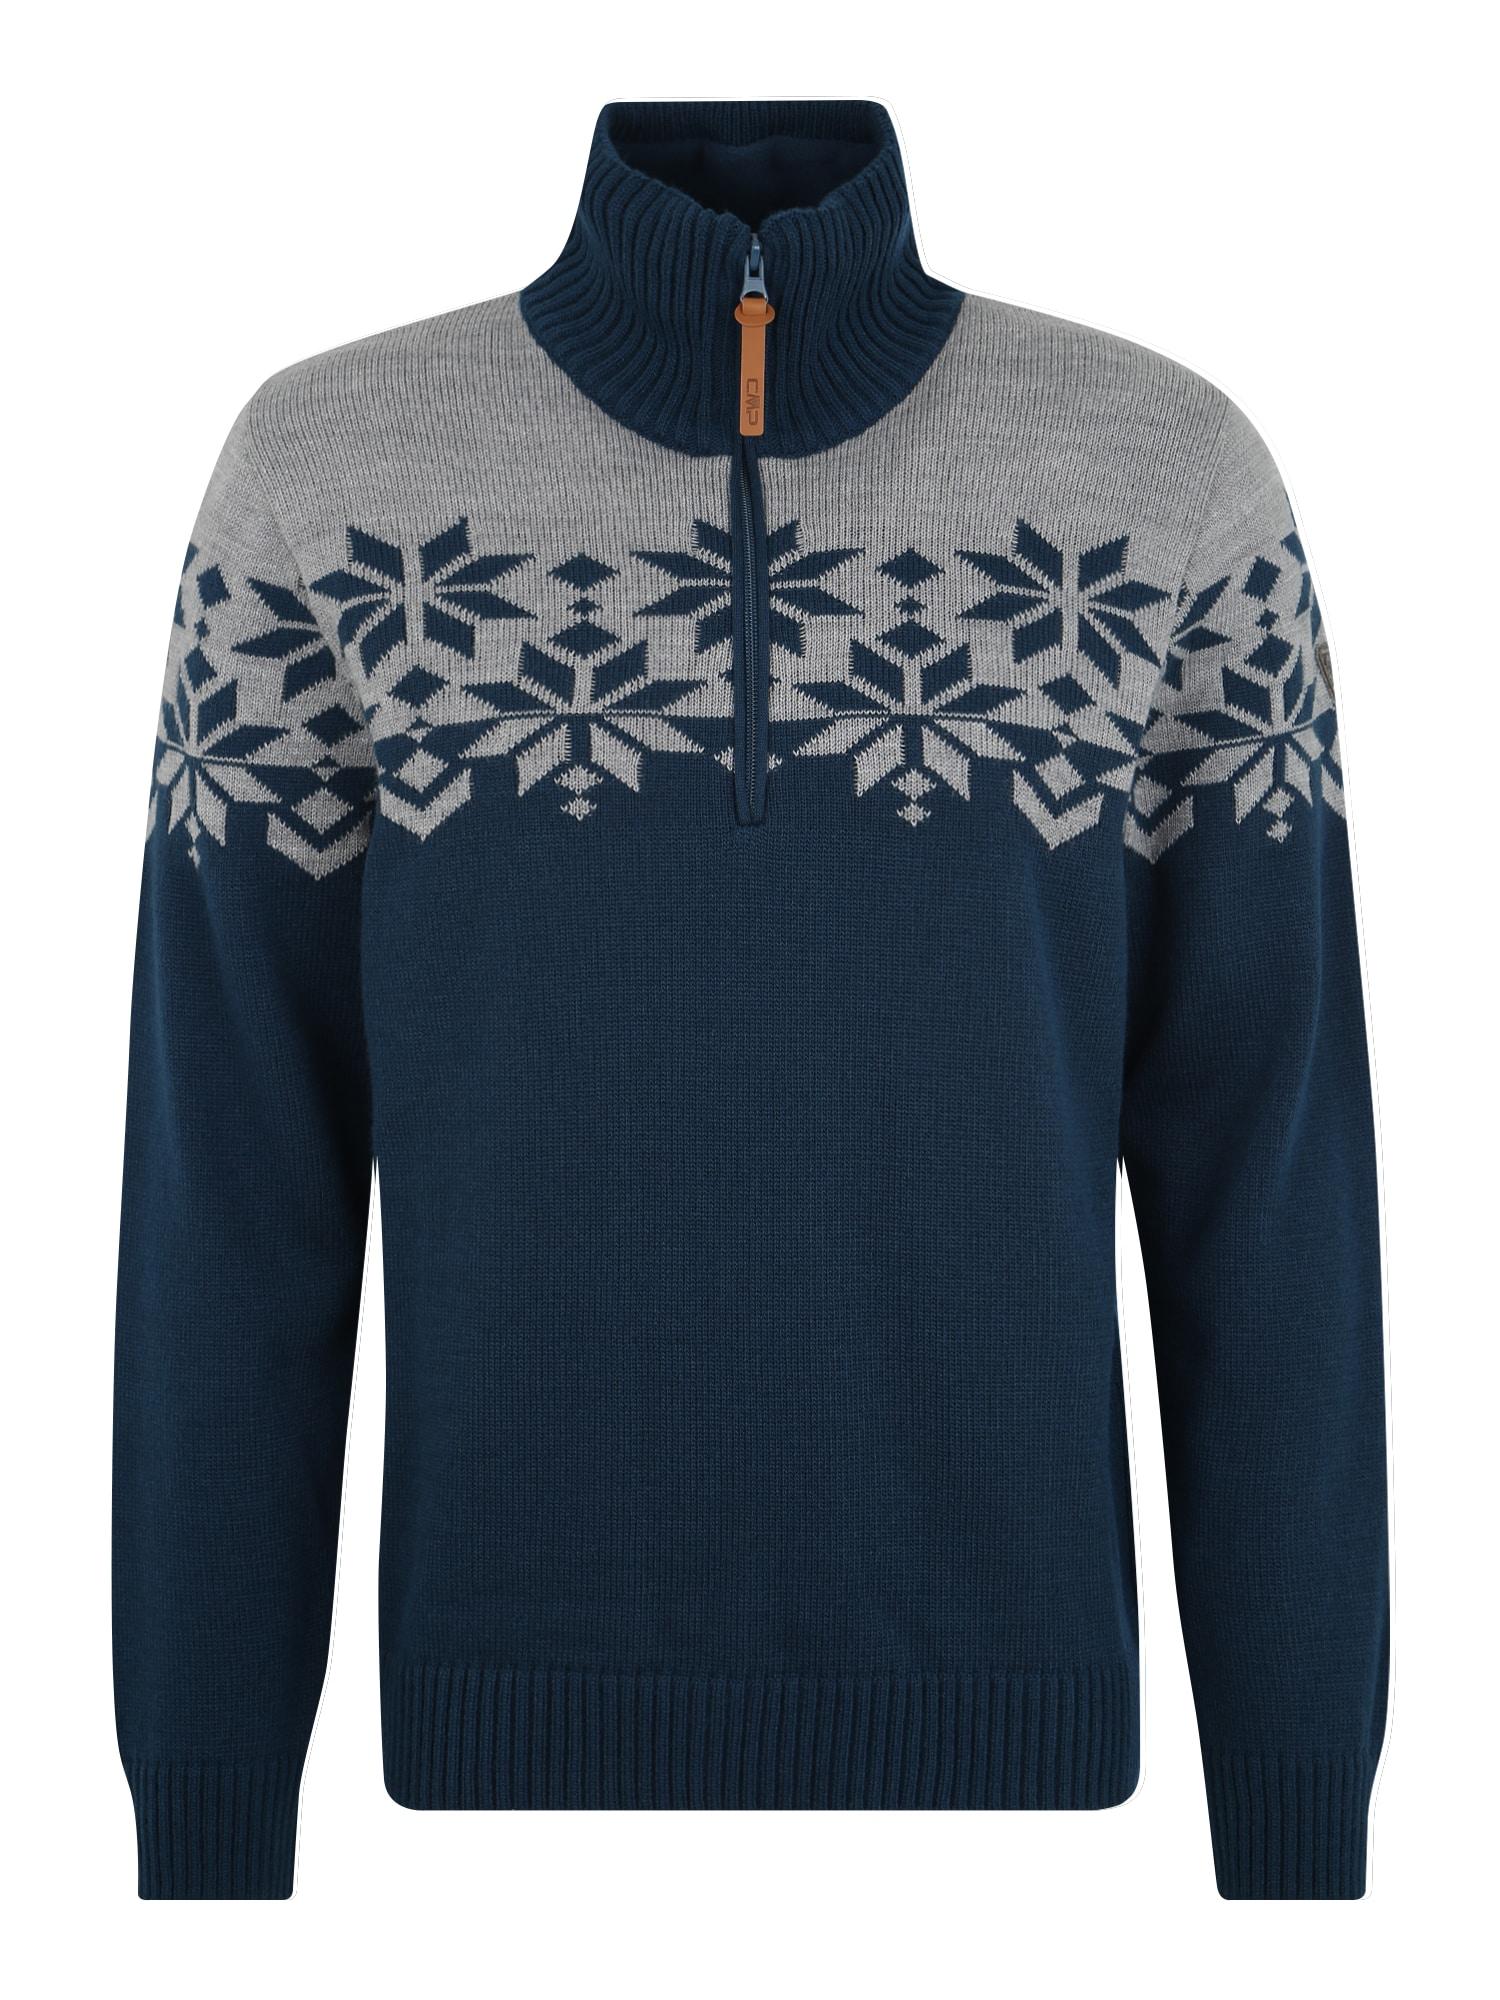 CMP Sportinis megztinis pilka / tamsiai mėlyna